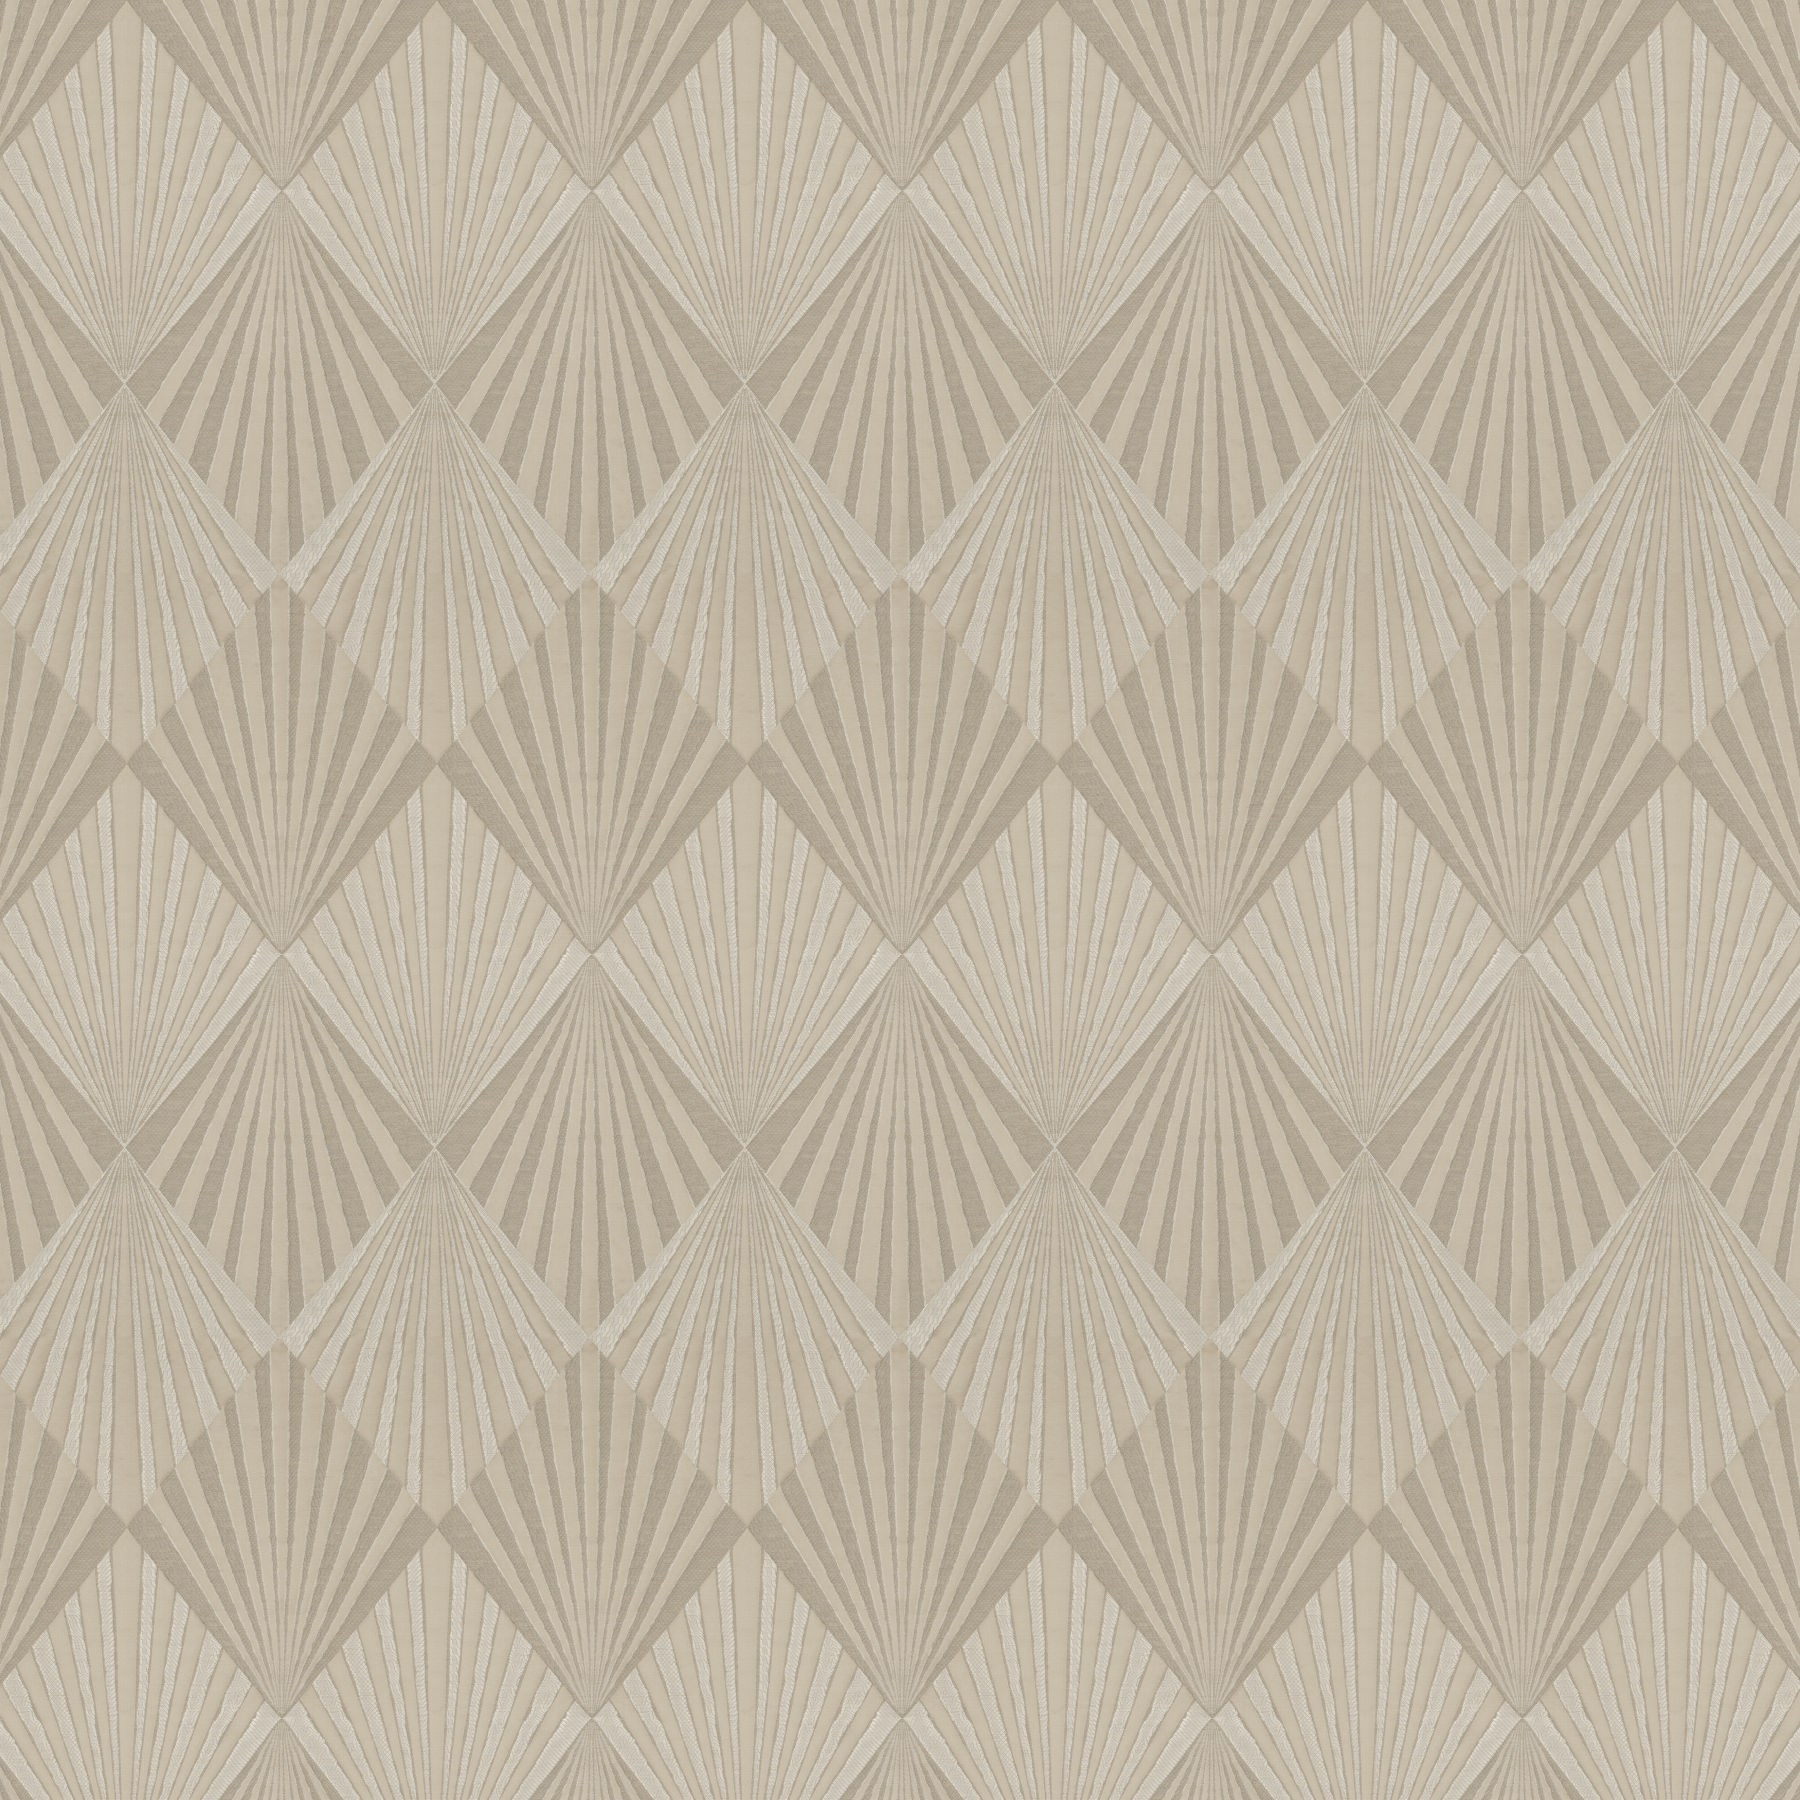 decoration fabric desire 9 7714 091 jab anstoetz fabrics. Black Bedroom Furniture Sets. Home Design Ideas